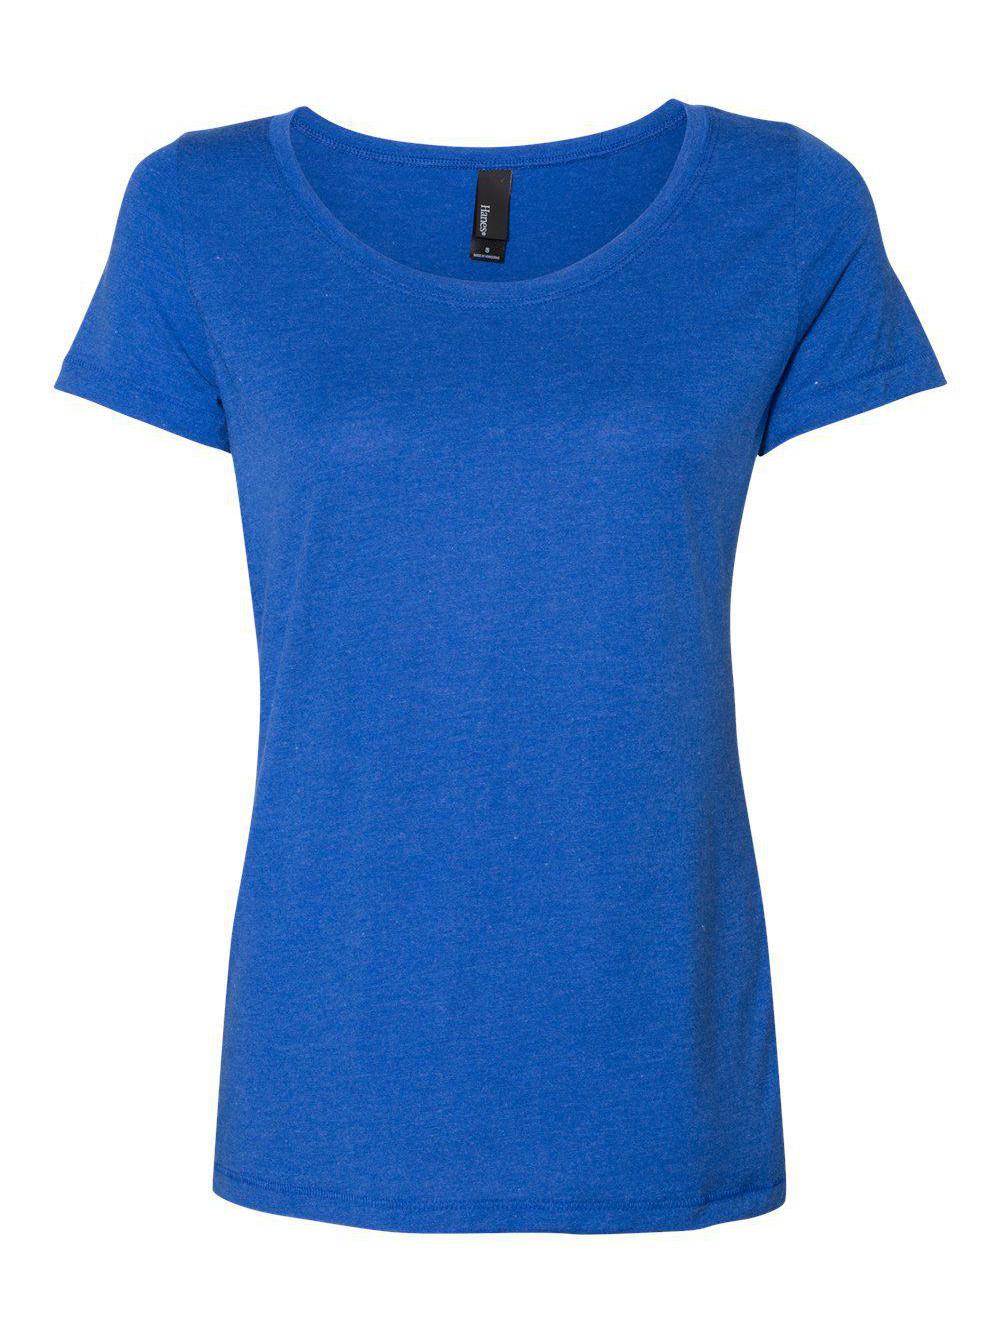 Hanes-Women-039-s-Modal-Triblend-T-Shirt-MO150 thumbnail 20